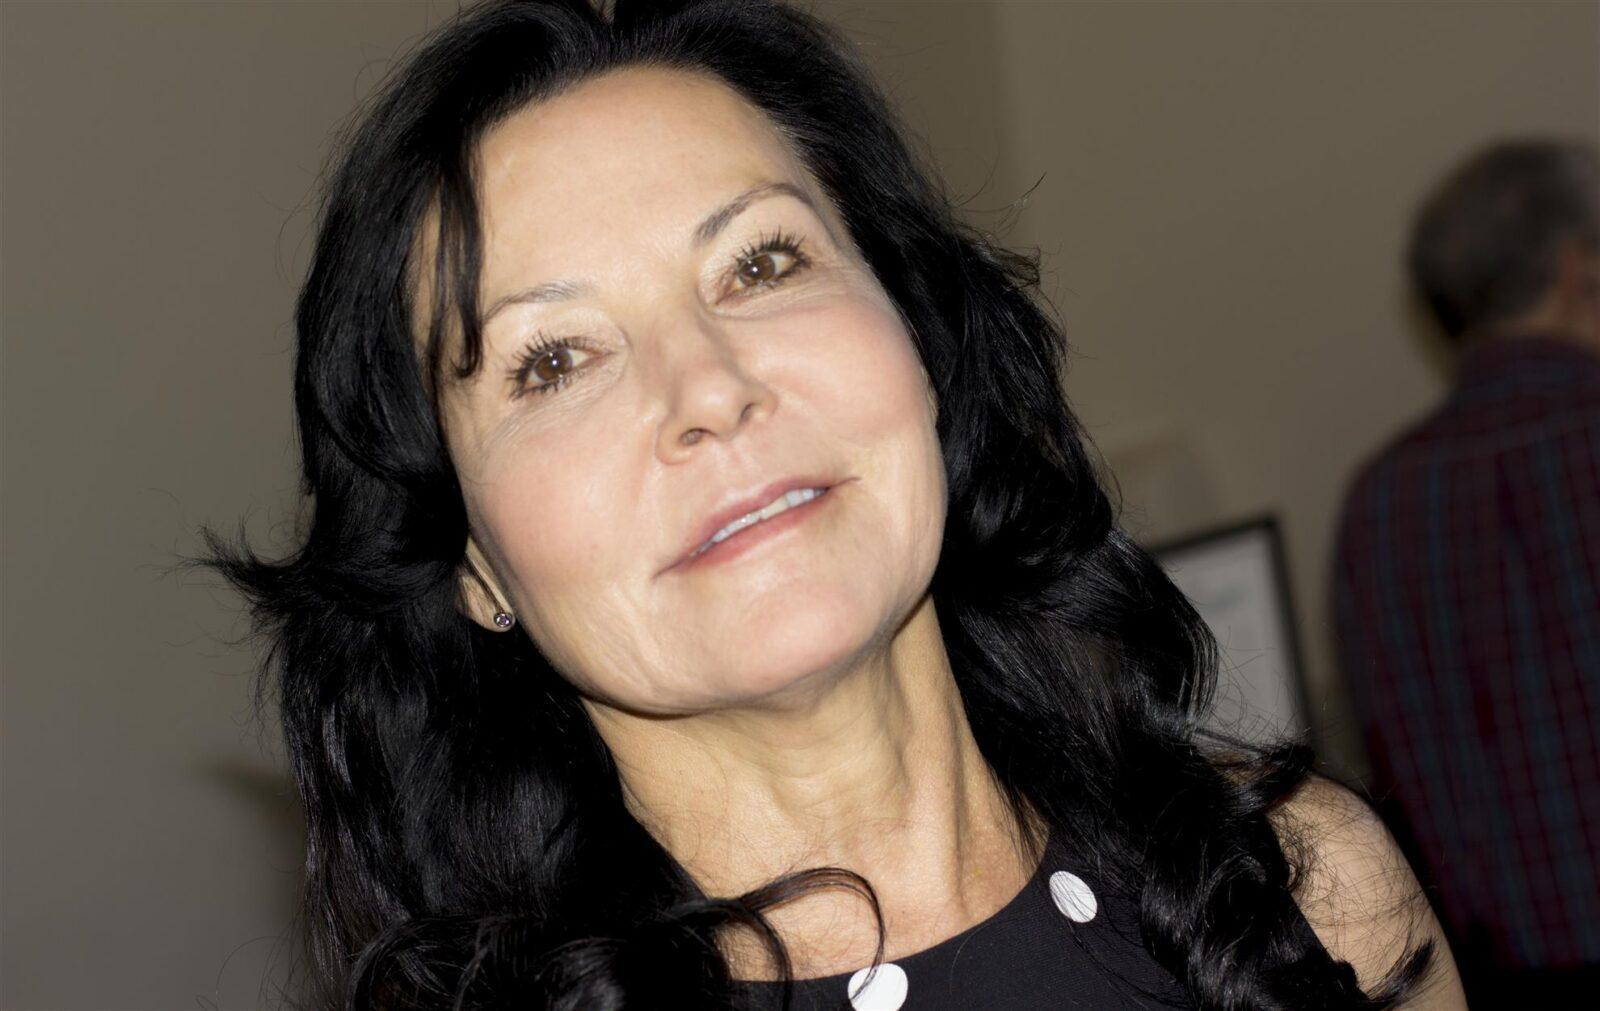 Linda Mross